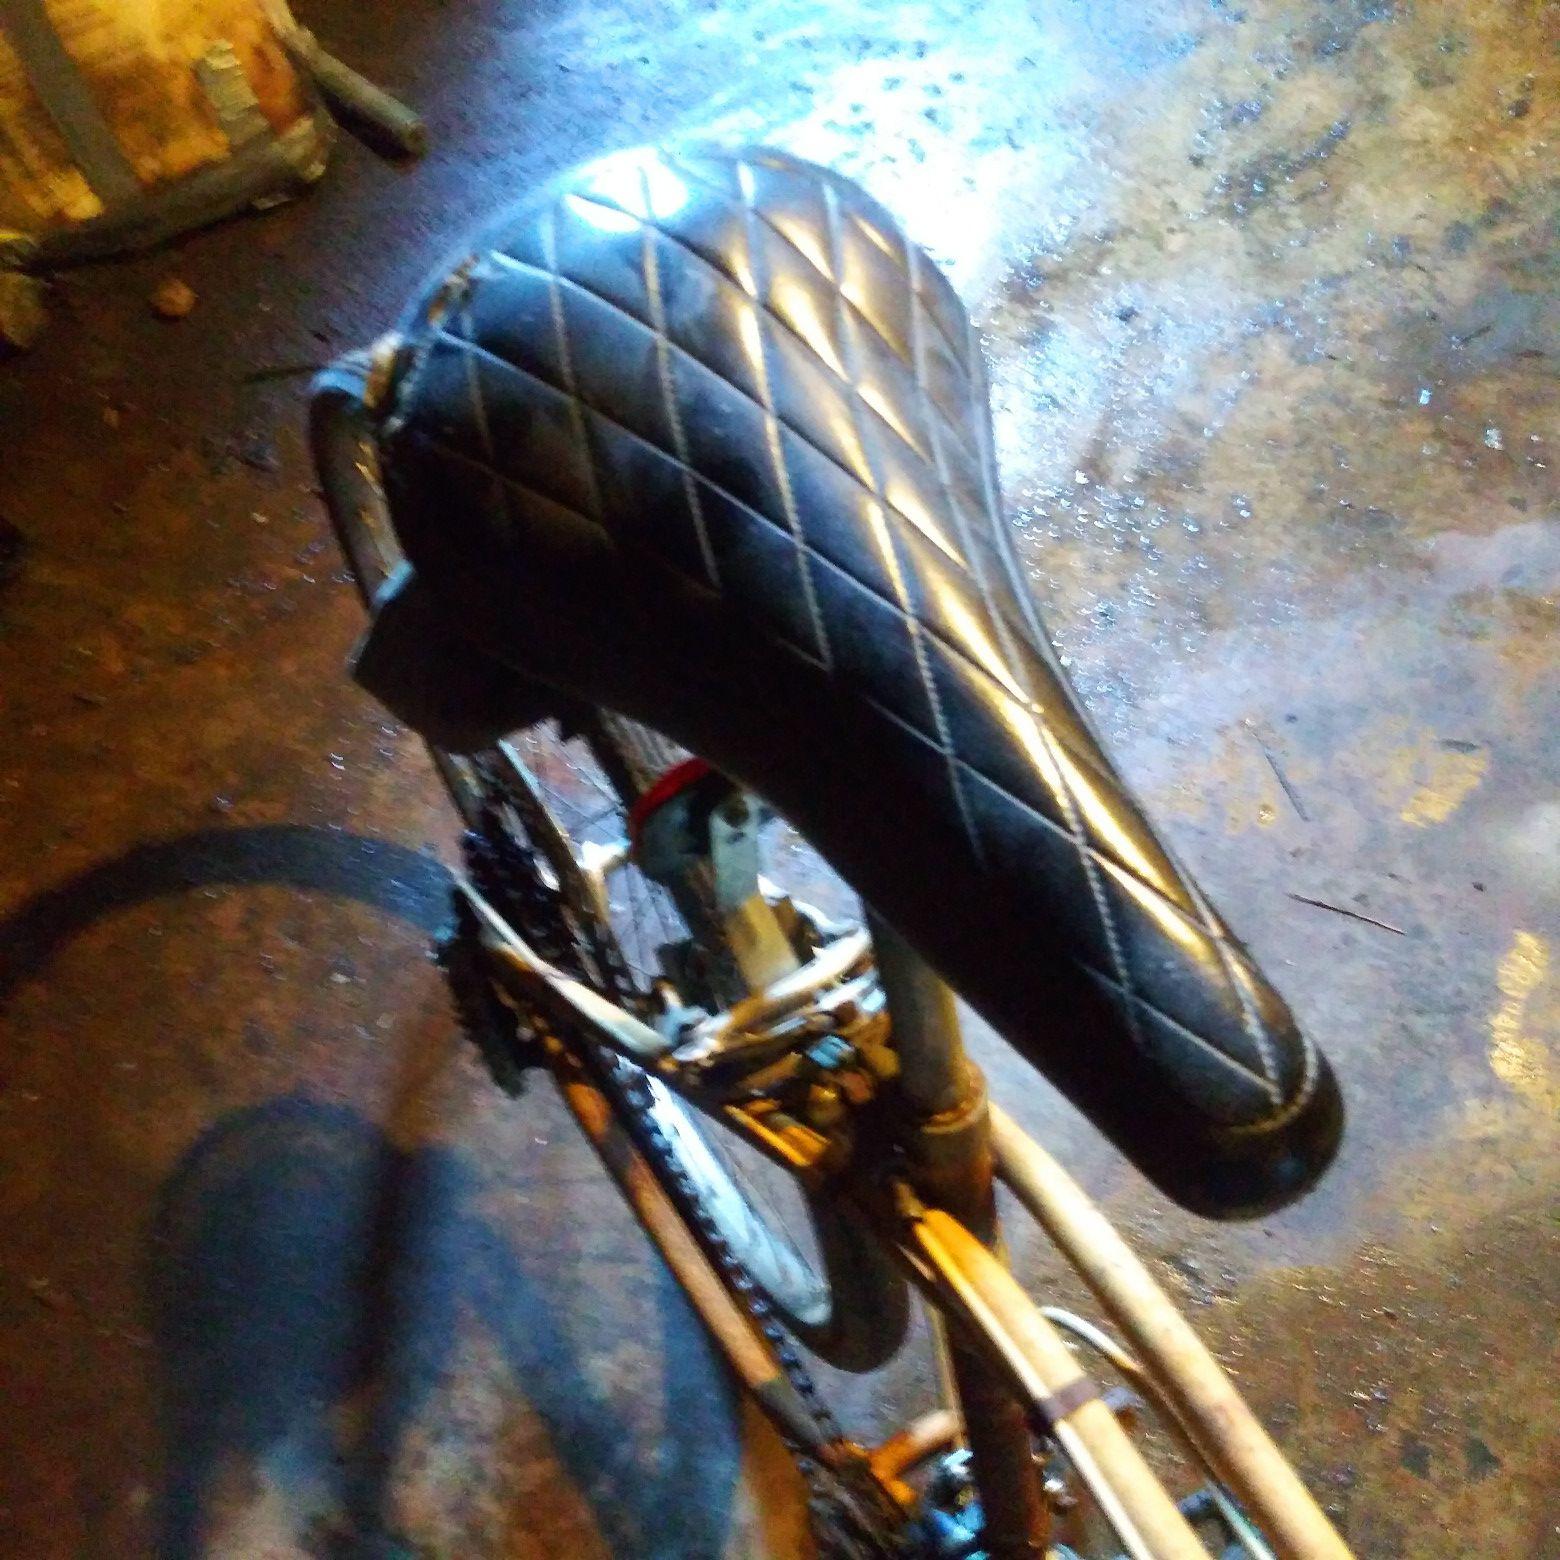 1970s sears 10 speed bike